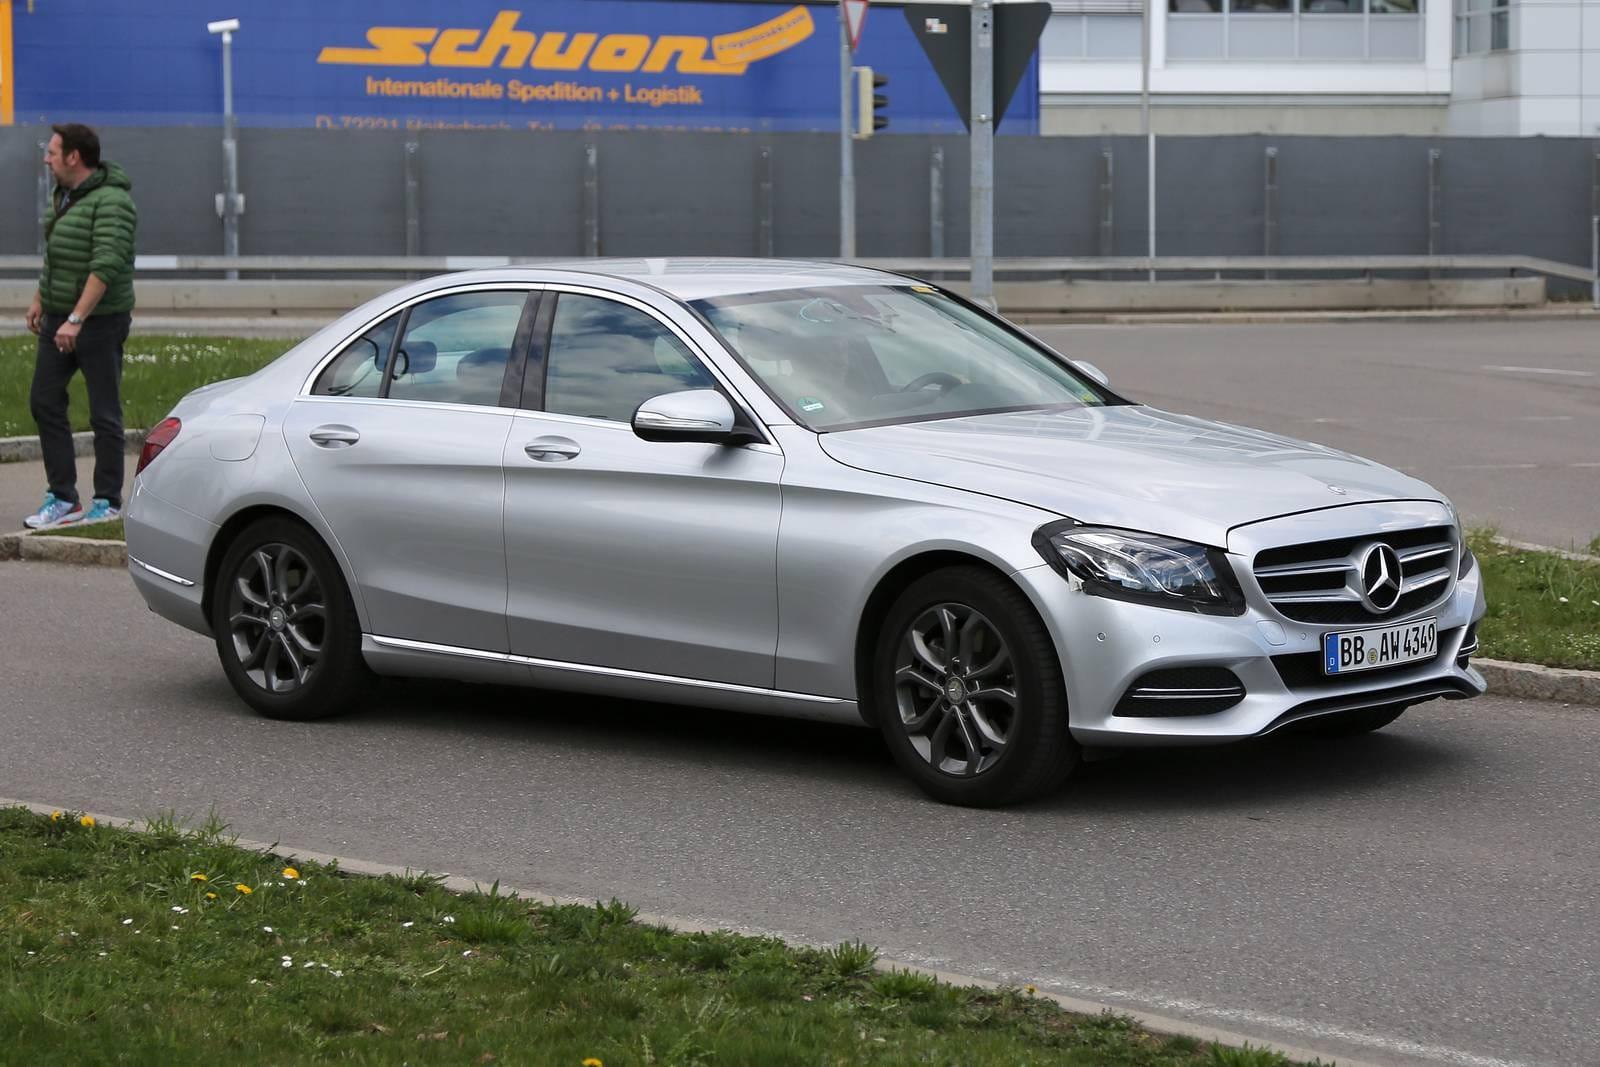 Mercedes Benz C-Class petrol gets a new engine